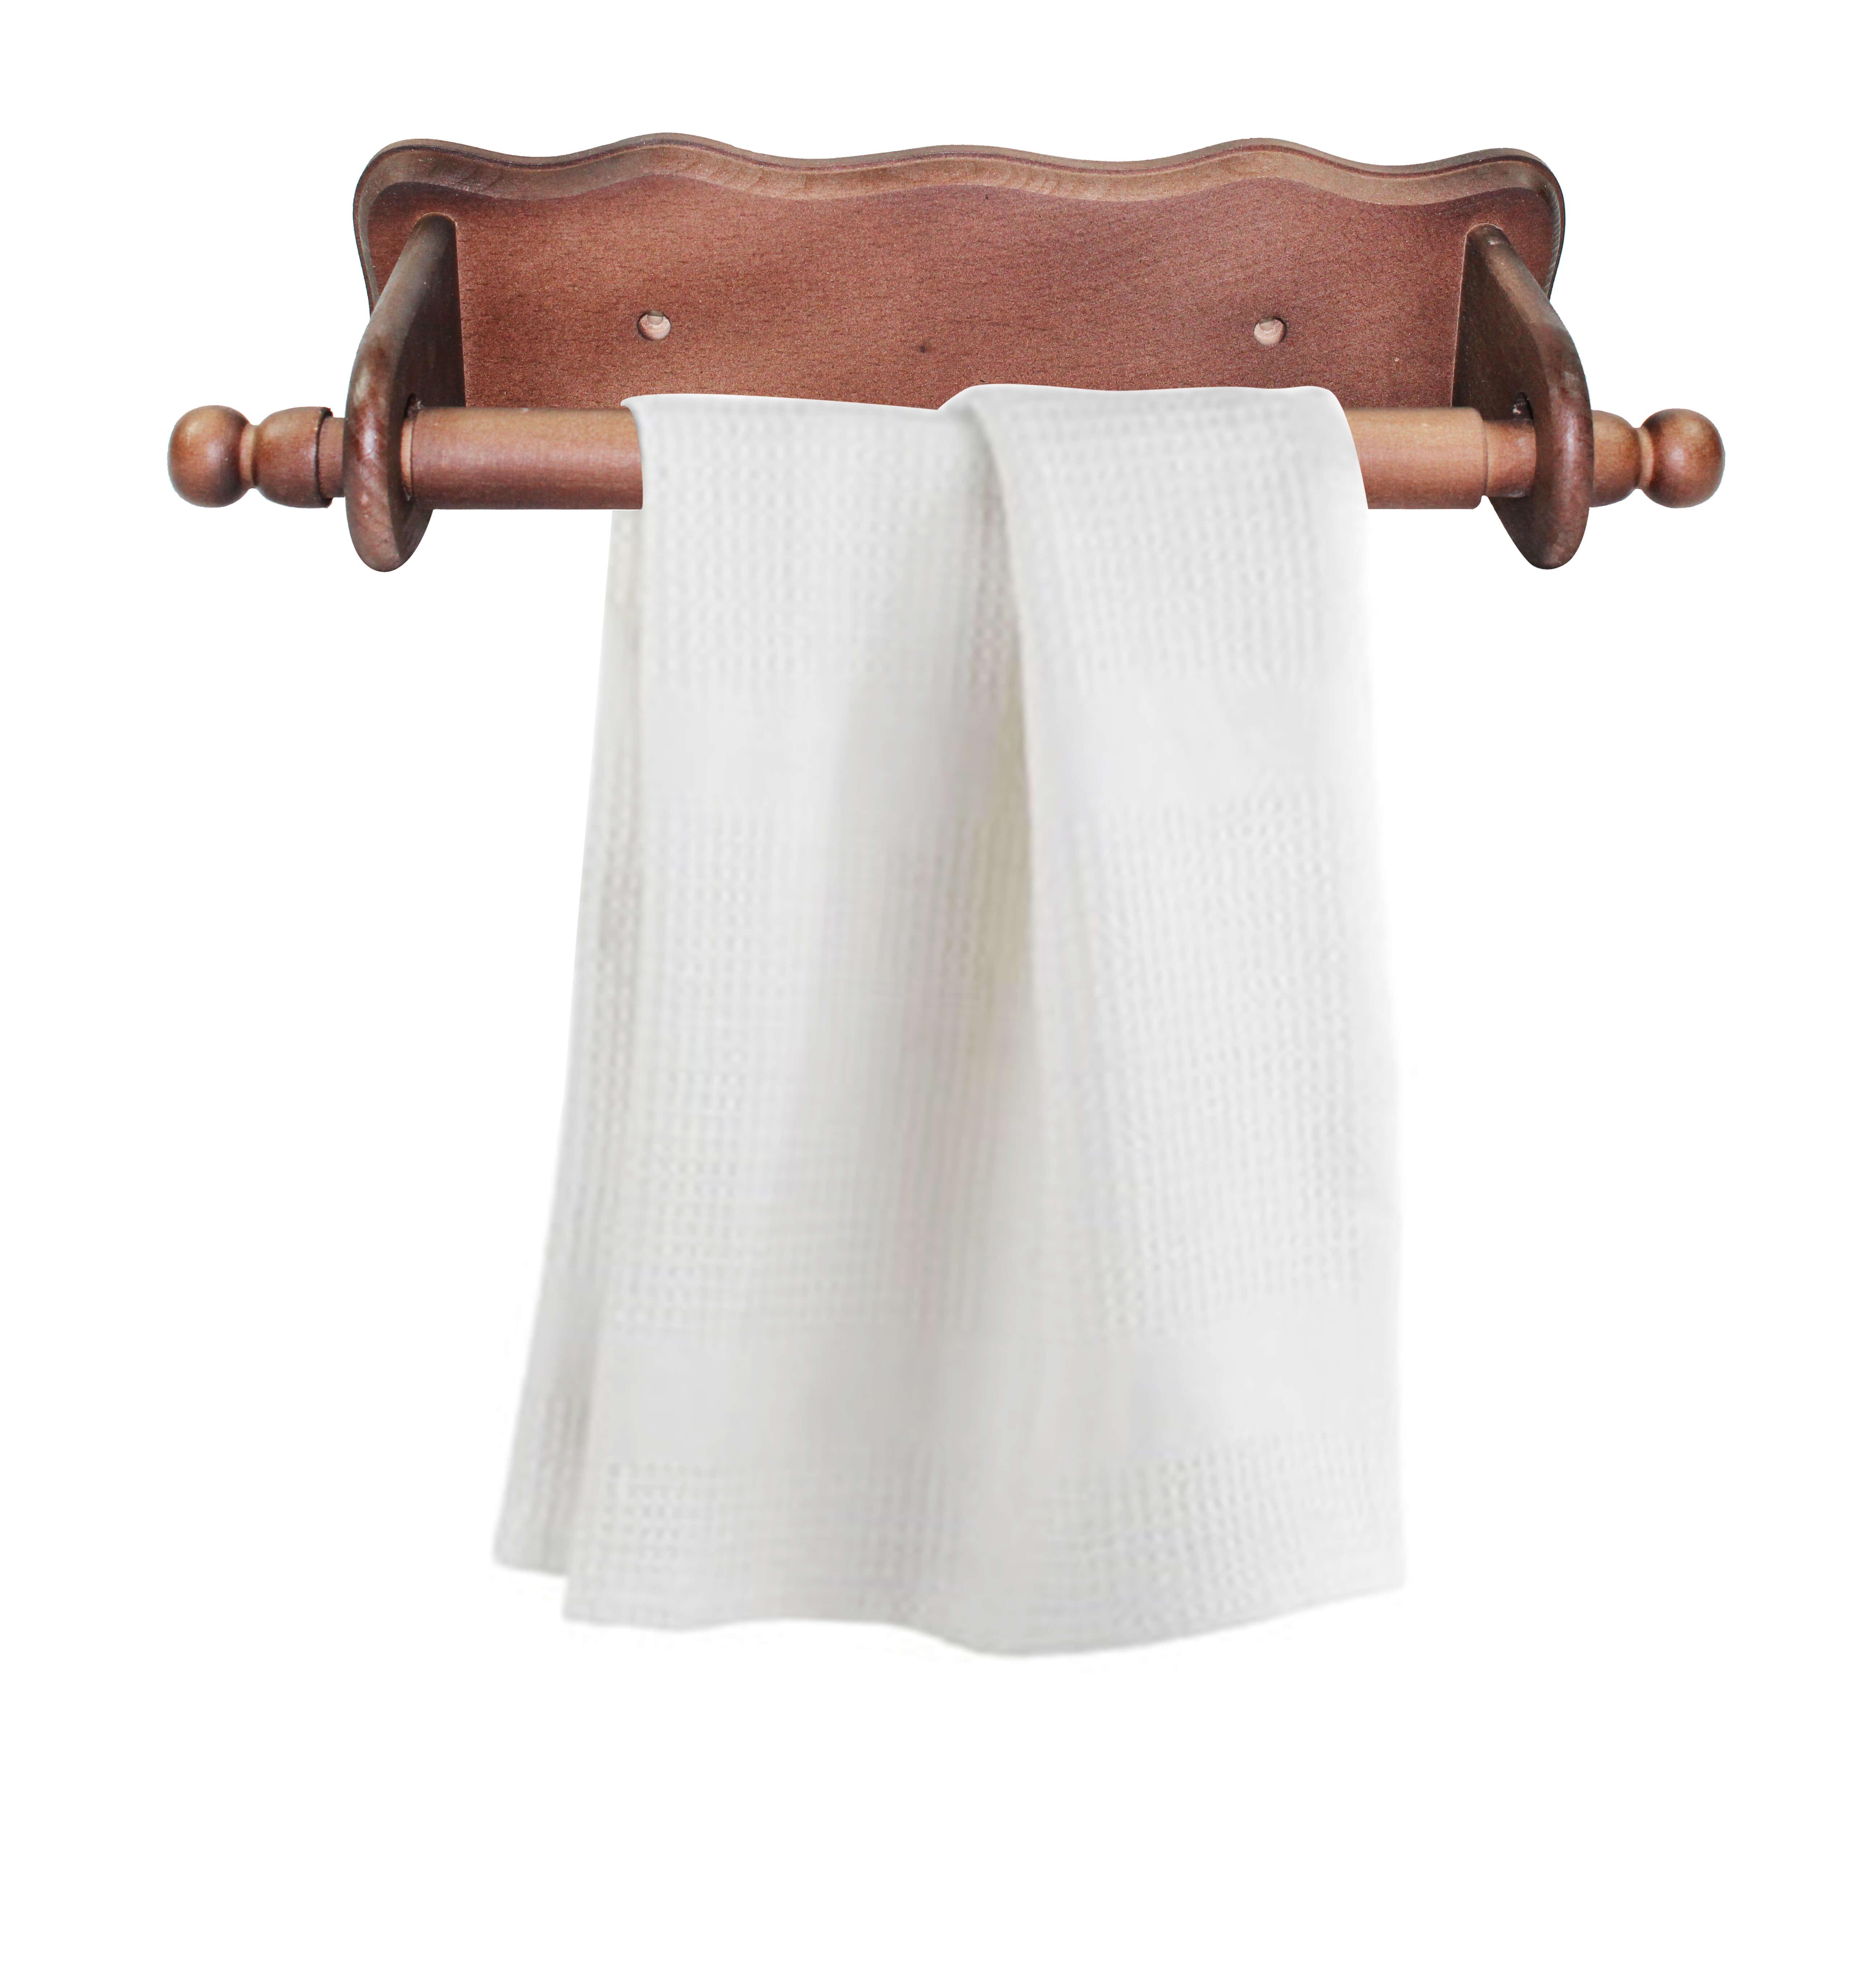 geschirrtuchhalter handtuchhalter halter holz tuchhalter. Black Bedroom Furniture Sets. Home Design Ideas